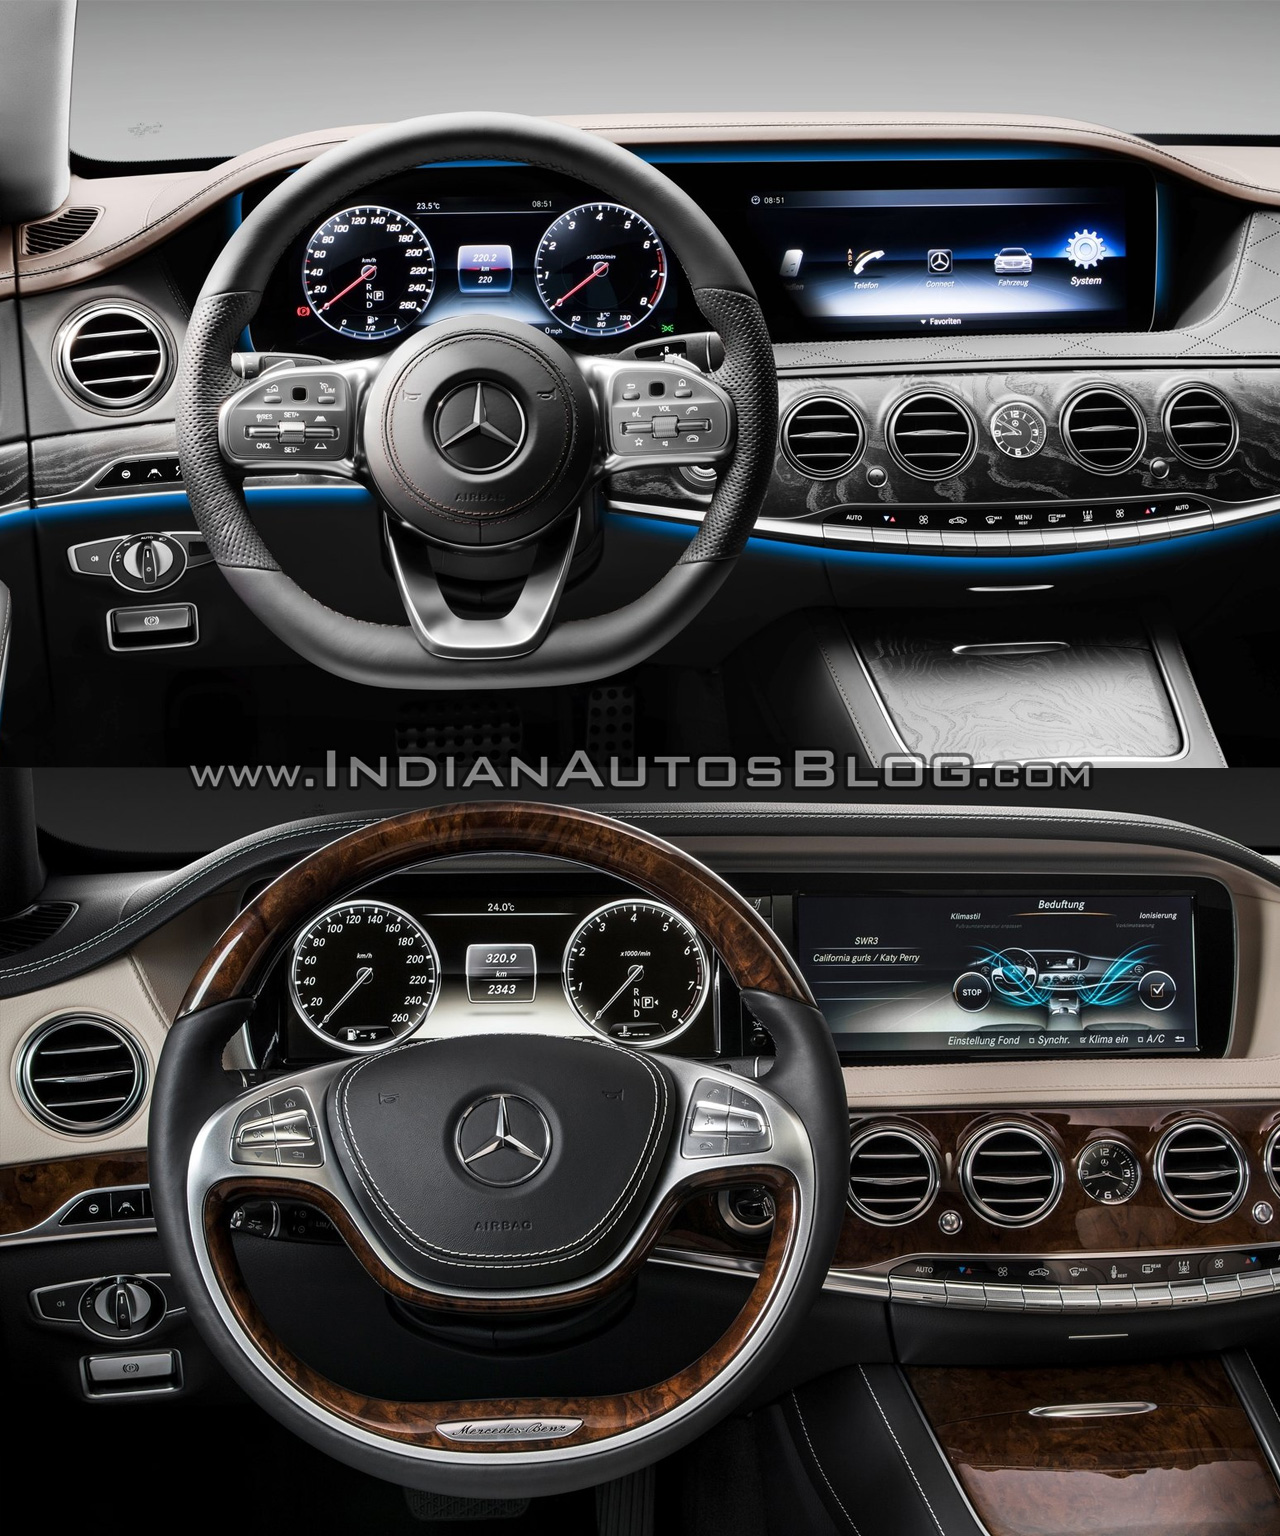 2017 Mercedes S-Class vs. 2013 Mercedes S-Class dashboard driver side